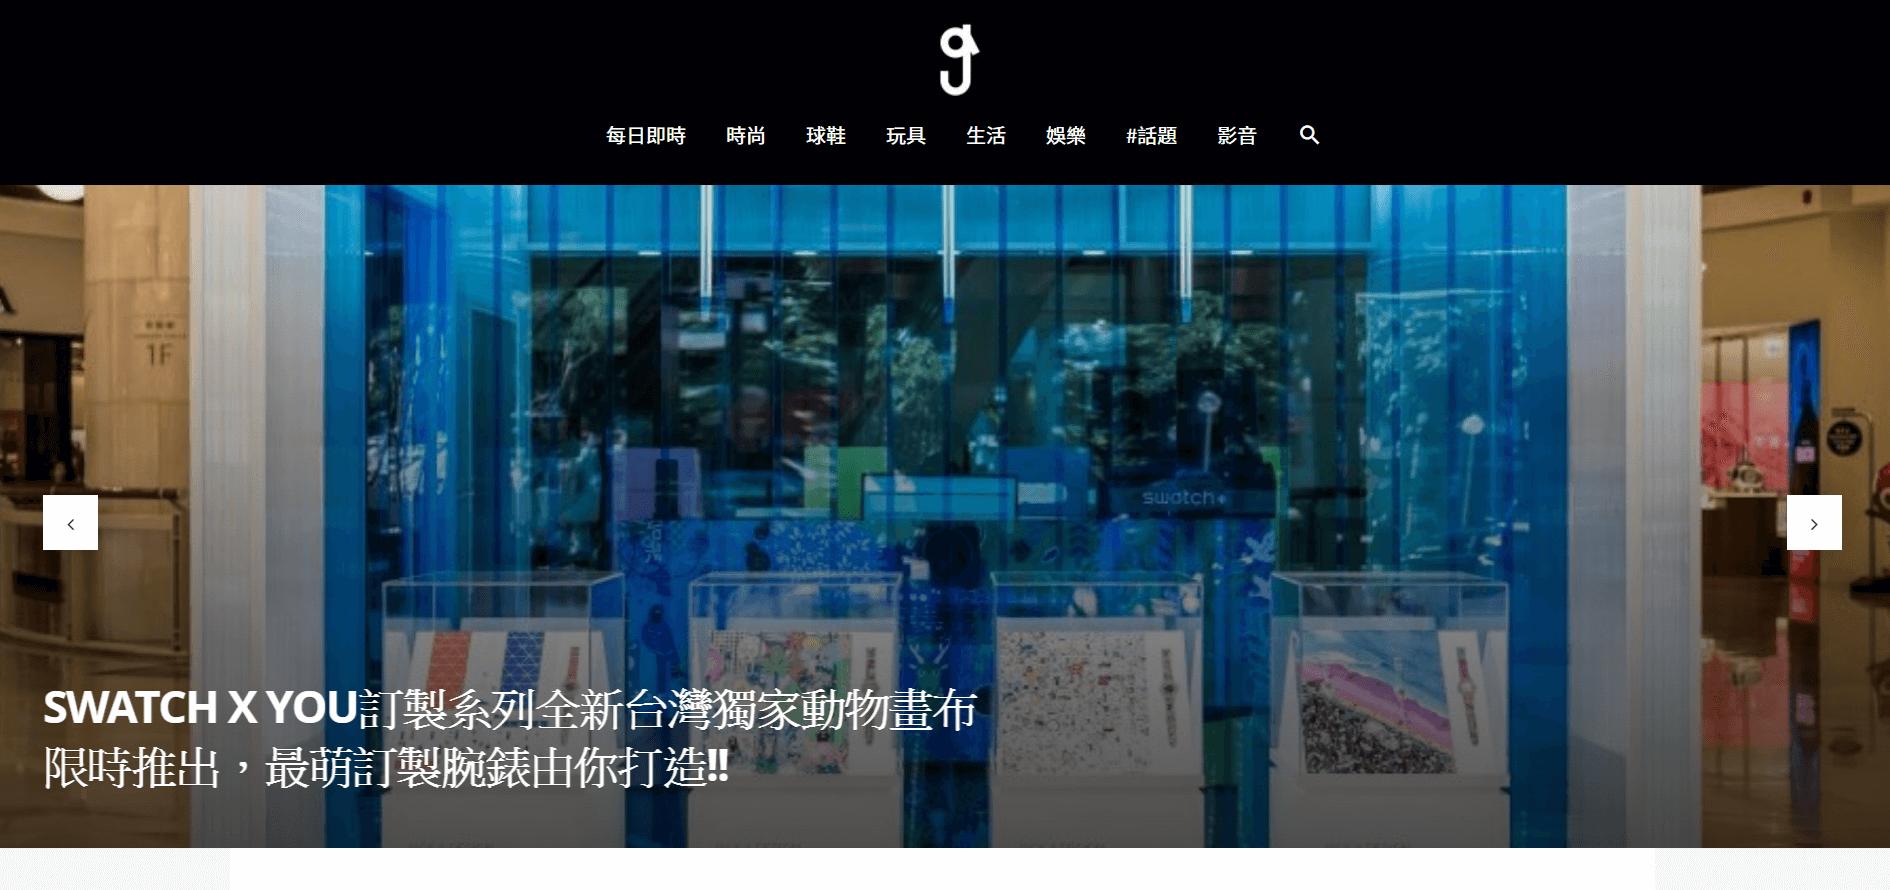 agoodmag追求時尚的新聞媒體-首頁-幻燈片